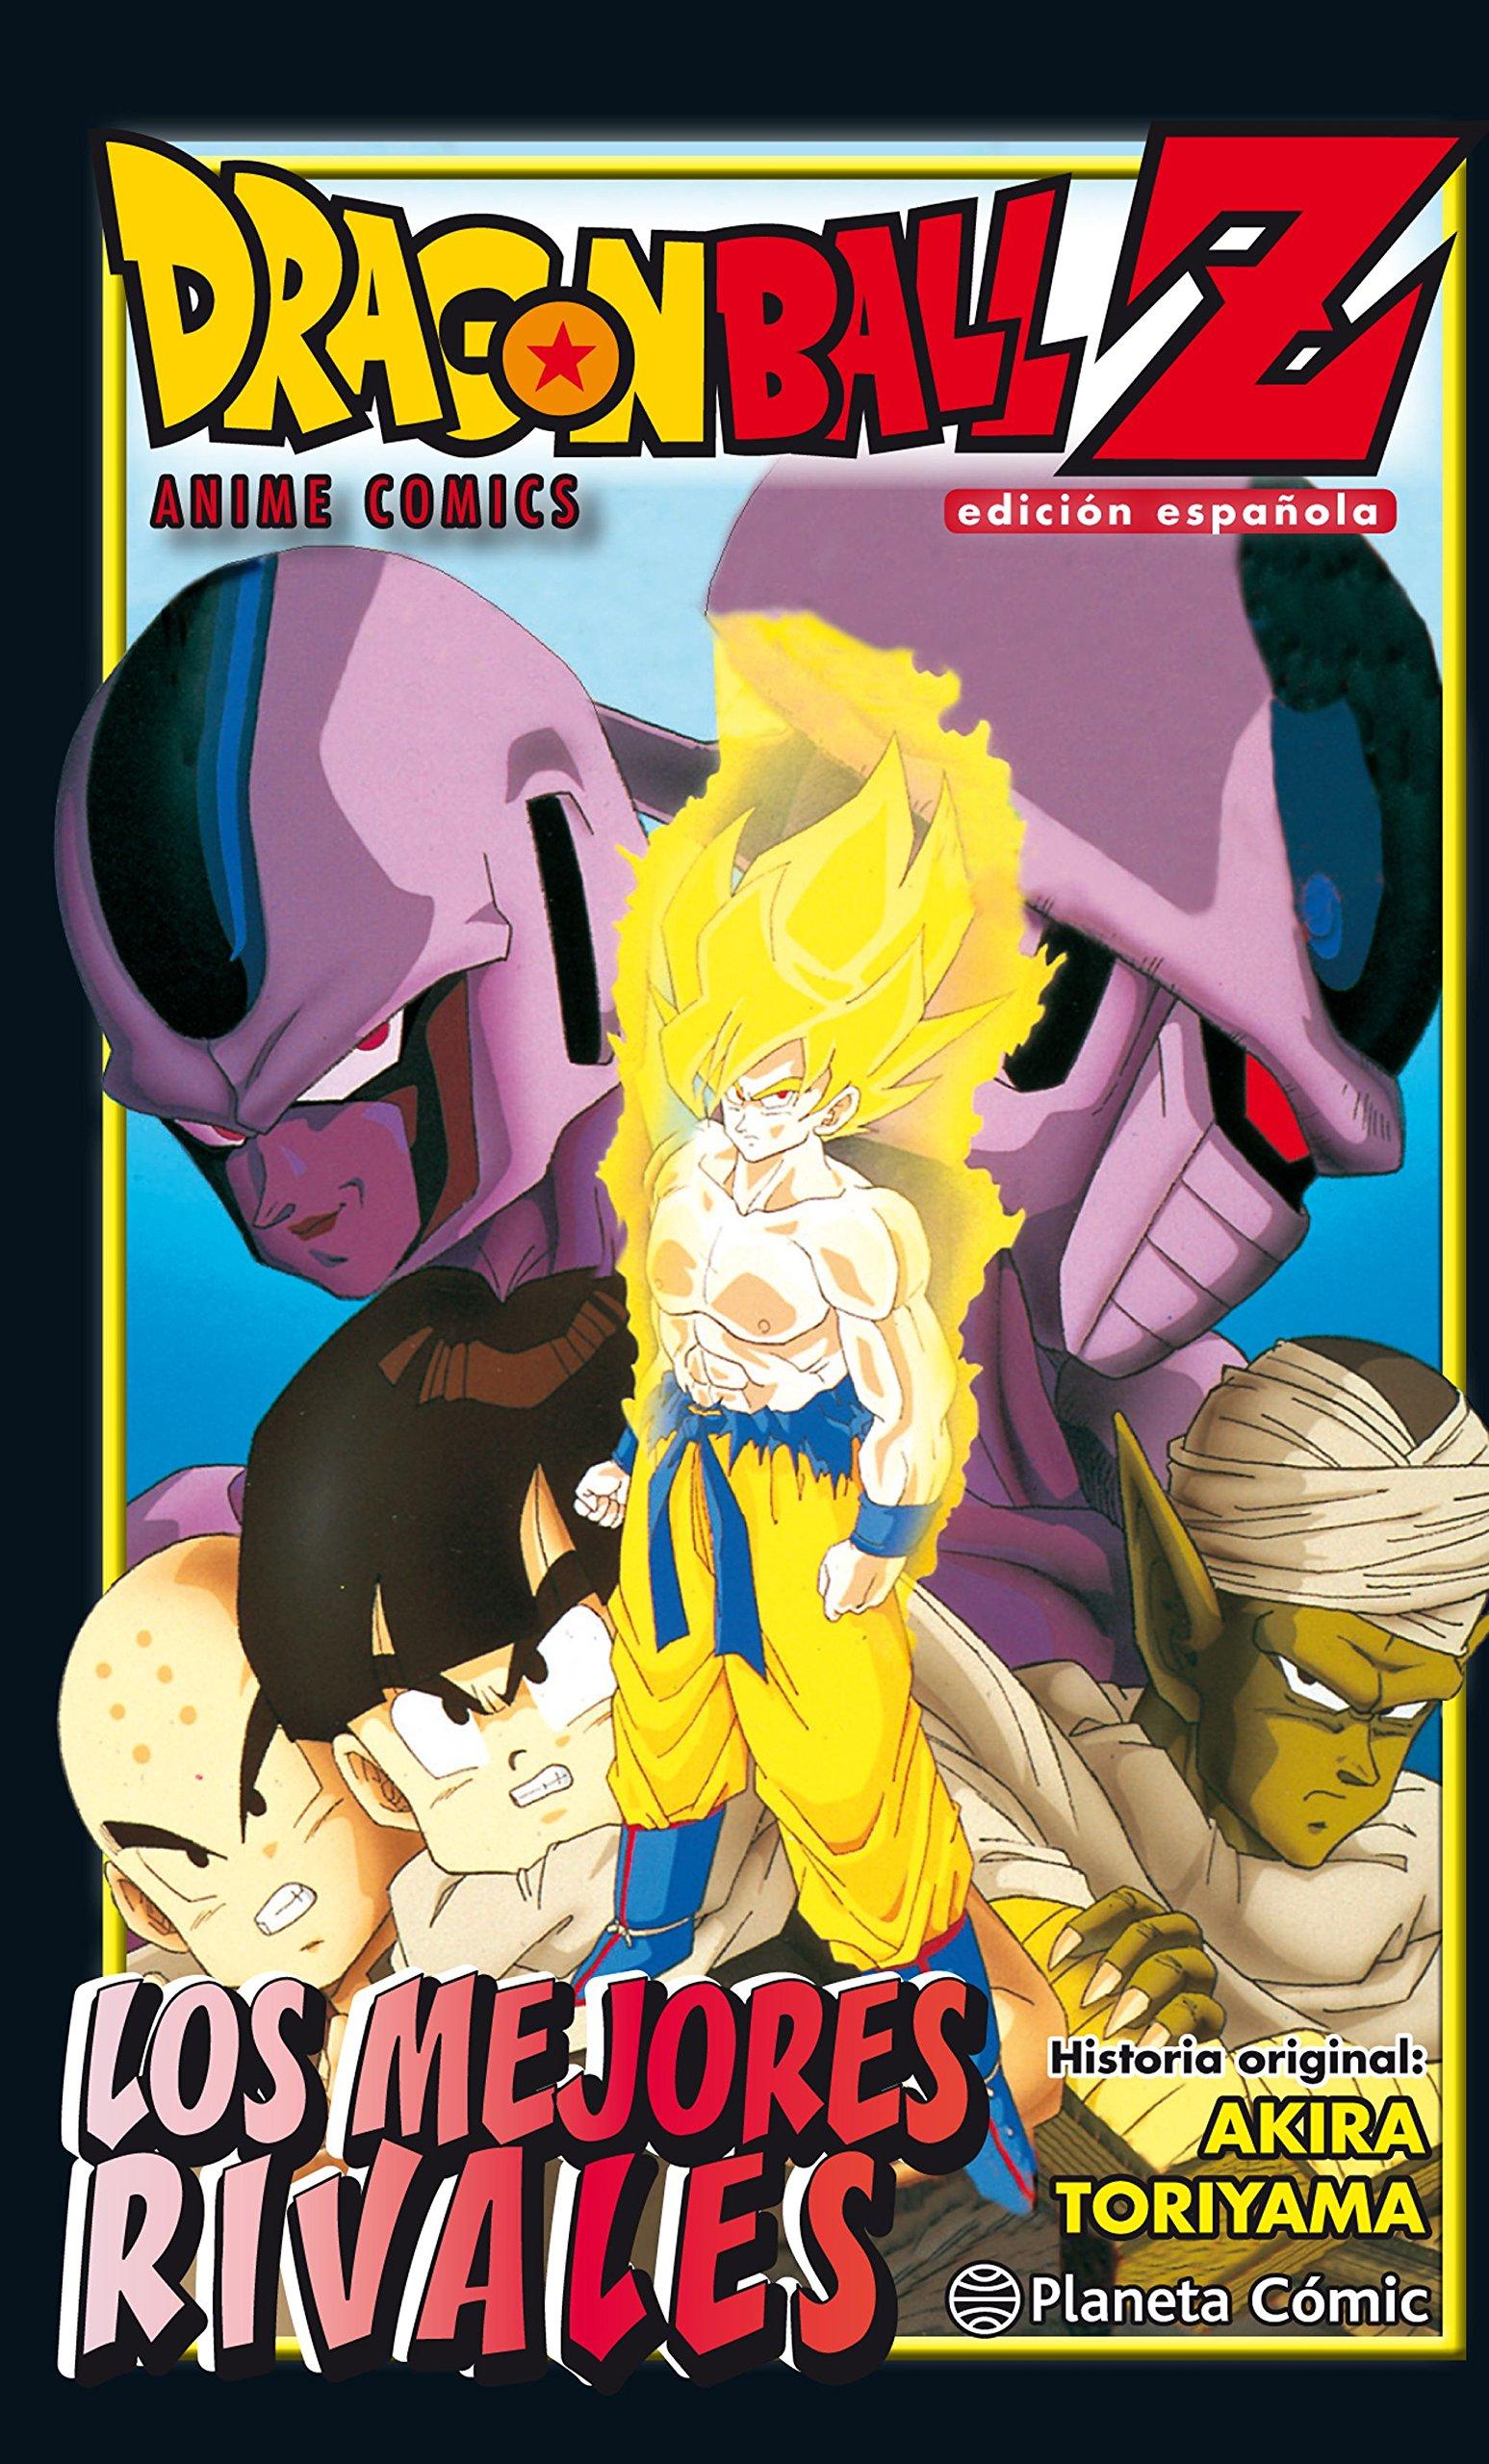 Dragon Ball Z Los mejores rivales (Manga Shonen): Amazon.es: Toriyama, Akira, Daruma: Libros